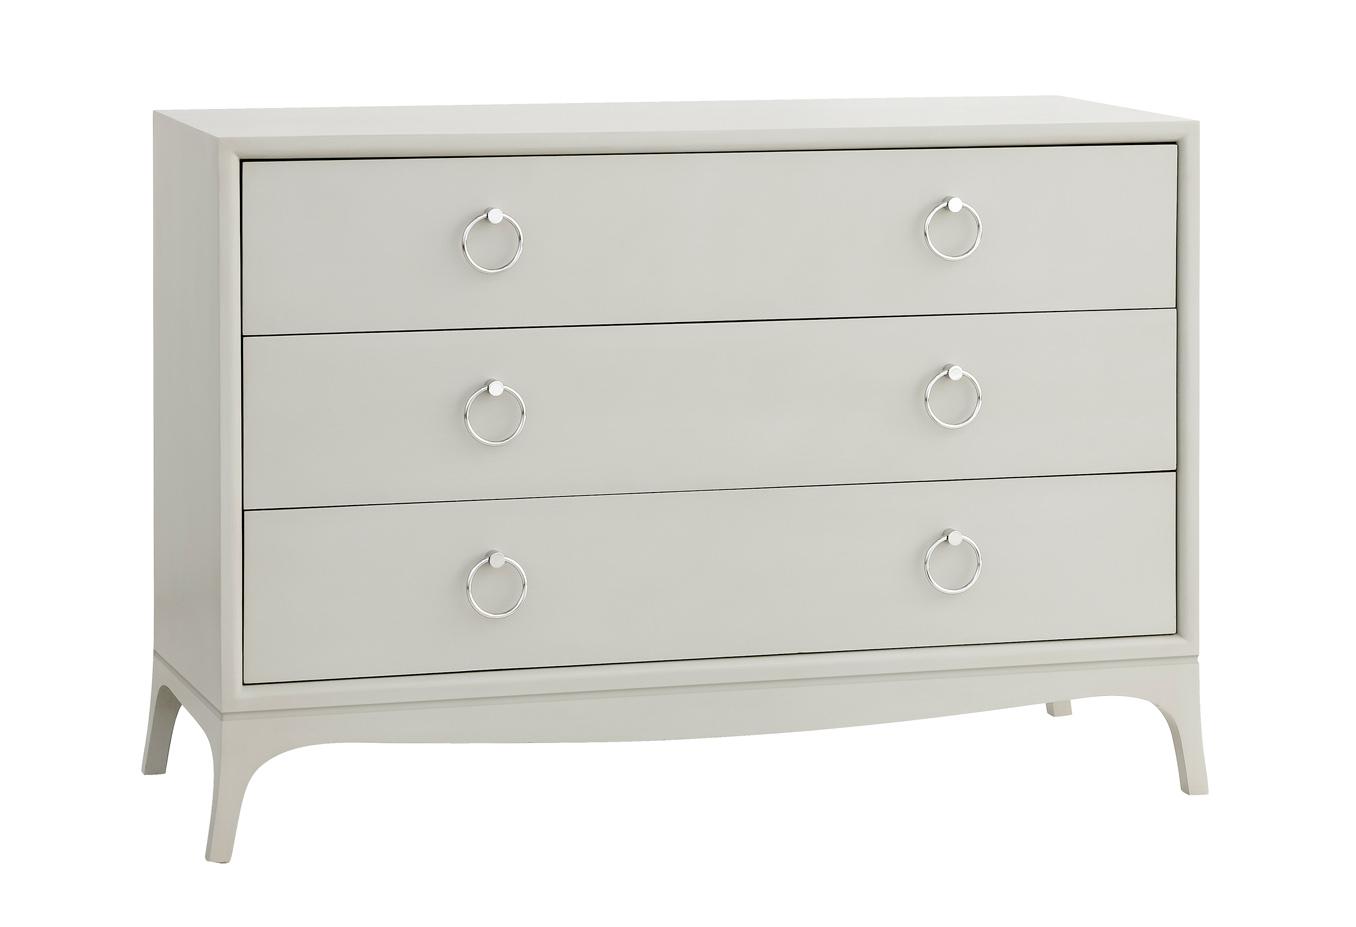 3 Drawer Dressers fiona 3 drawer dresser HECNJGL